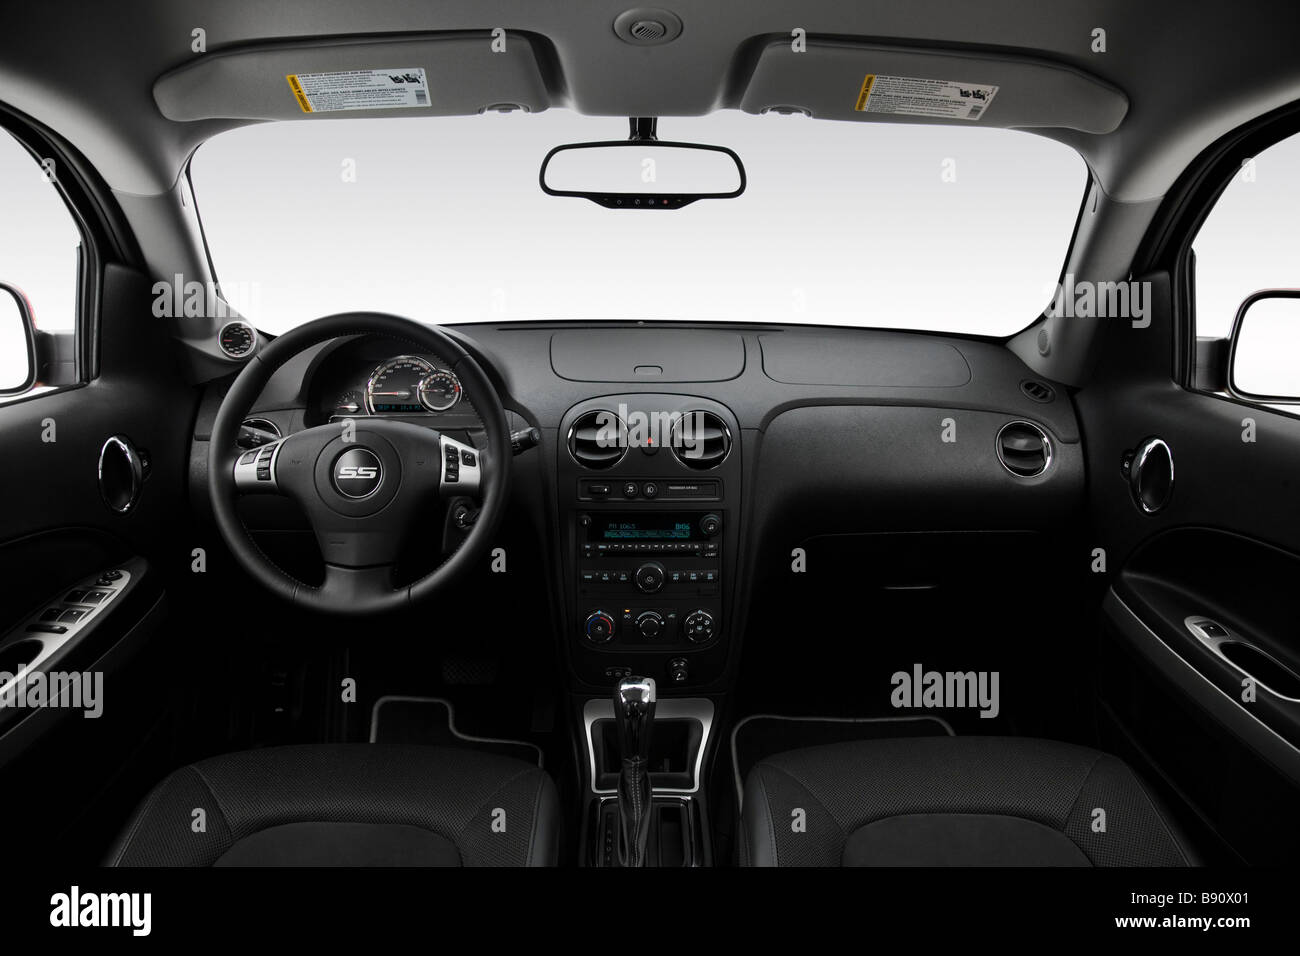 Chevrolet Hhr Stock Photos & Chevrolet Hhr Stock Images - Alamy